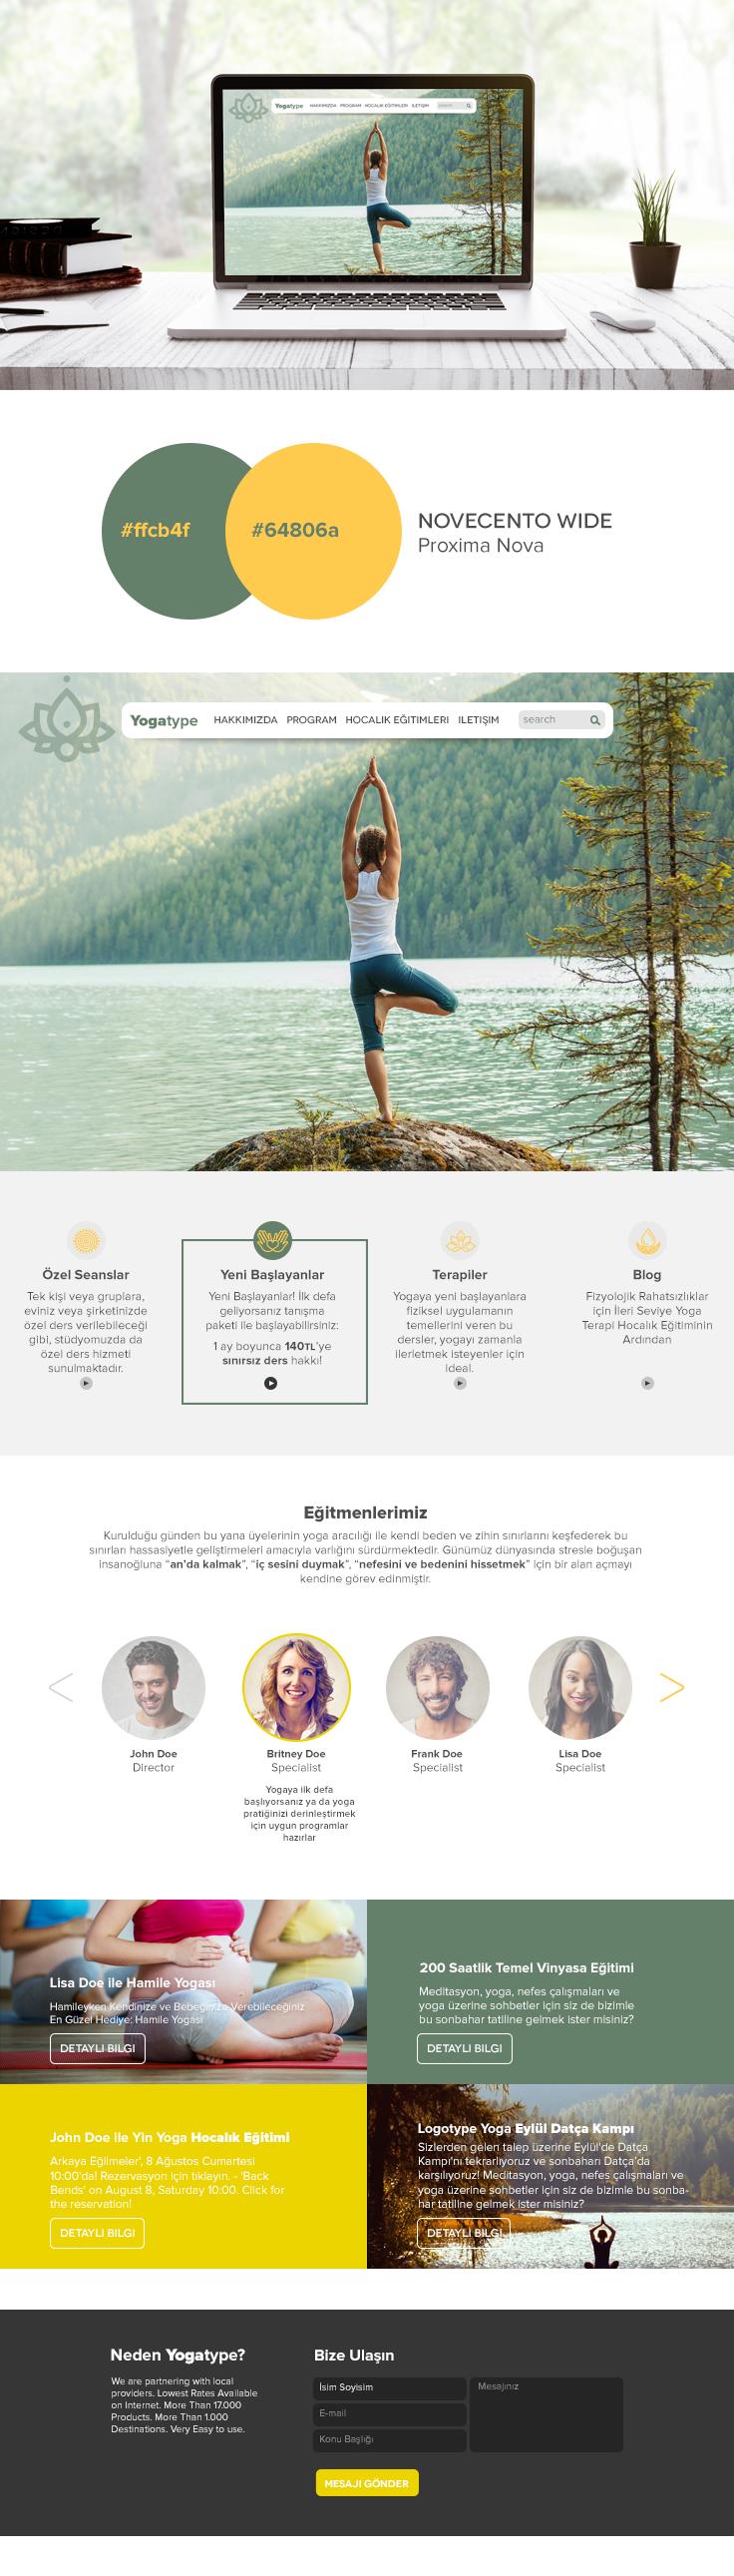 Enchanting Yoga Website Template Crest - Resume Ideas - namanasa.com